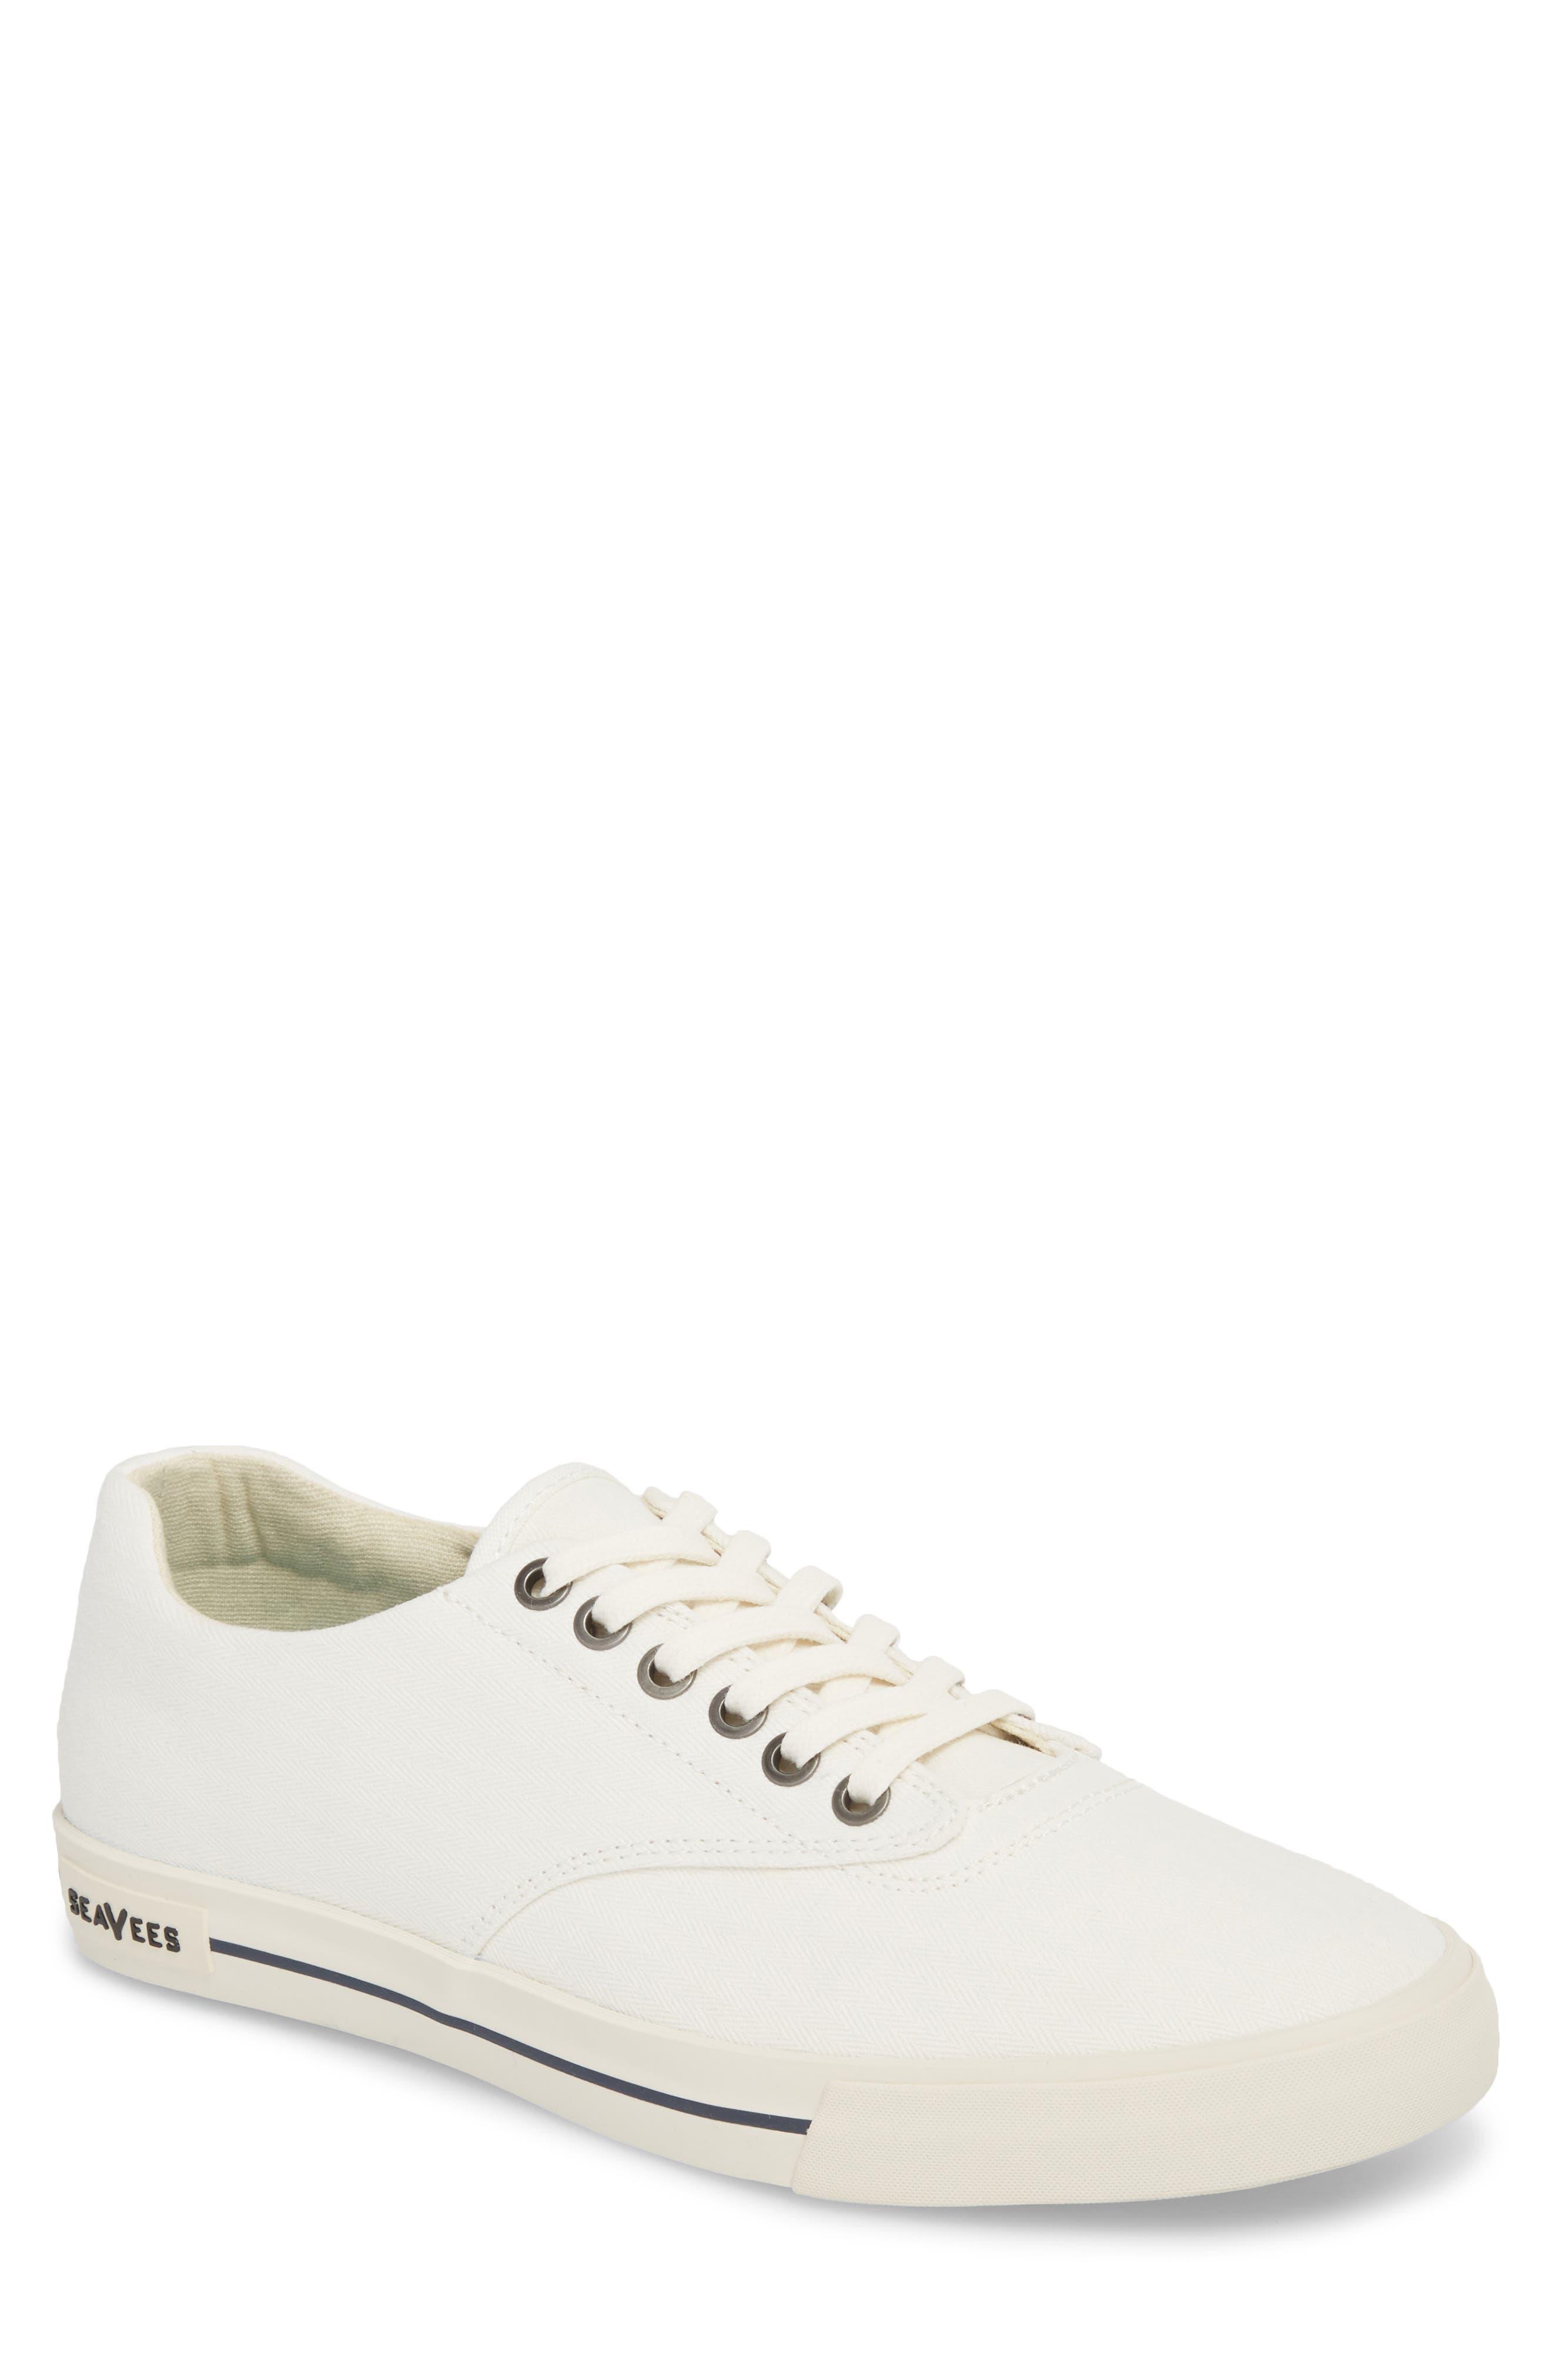 Hermosa Plimsoll Sneaker,                             Main thumbnail 1, color,                             Bleach White